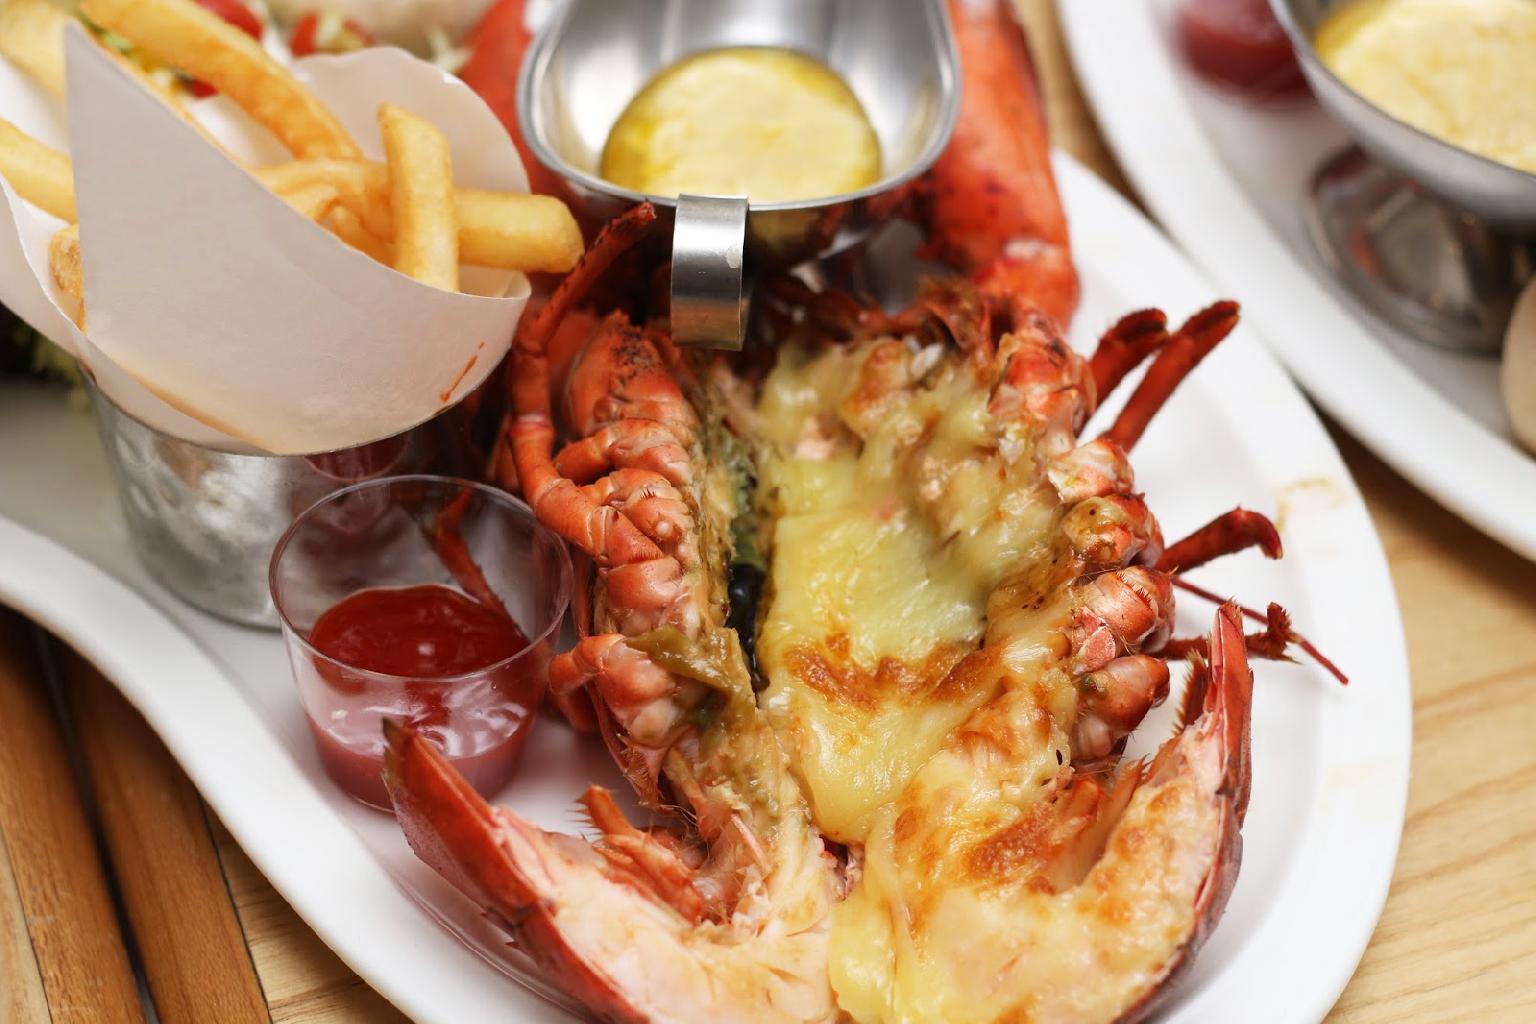 Kampung Lobster